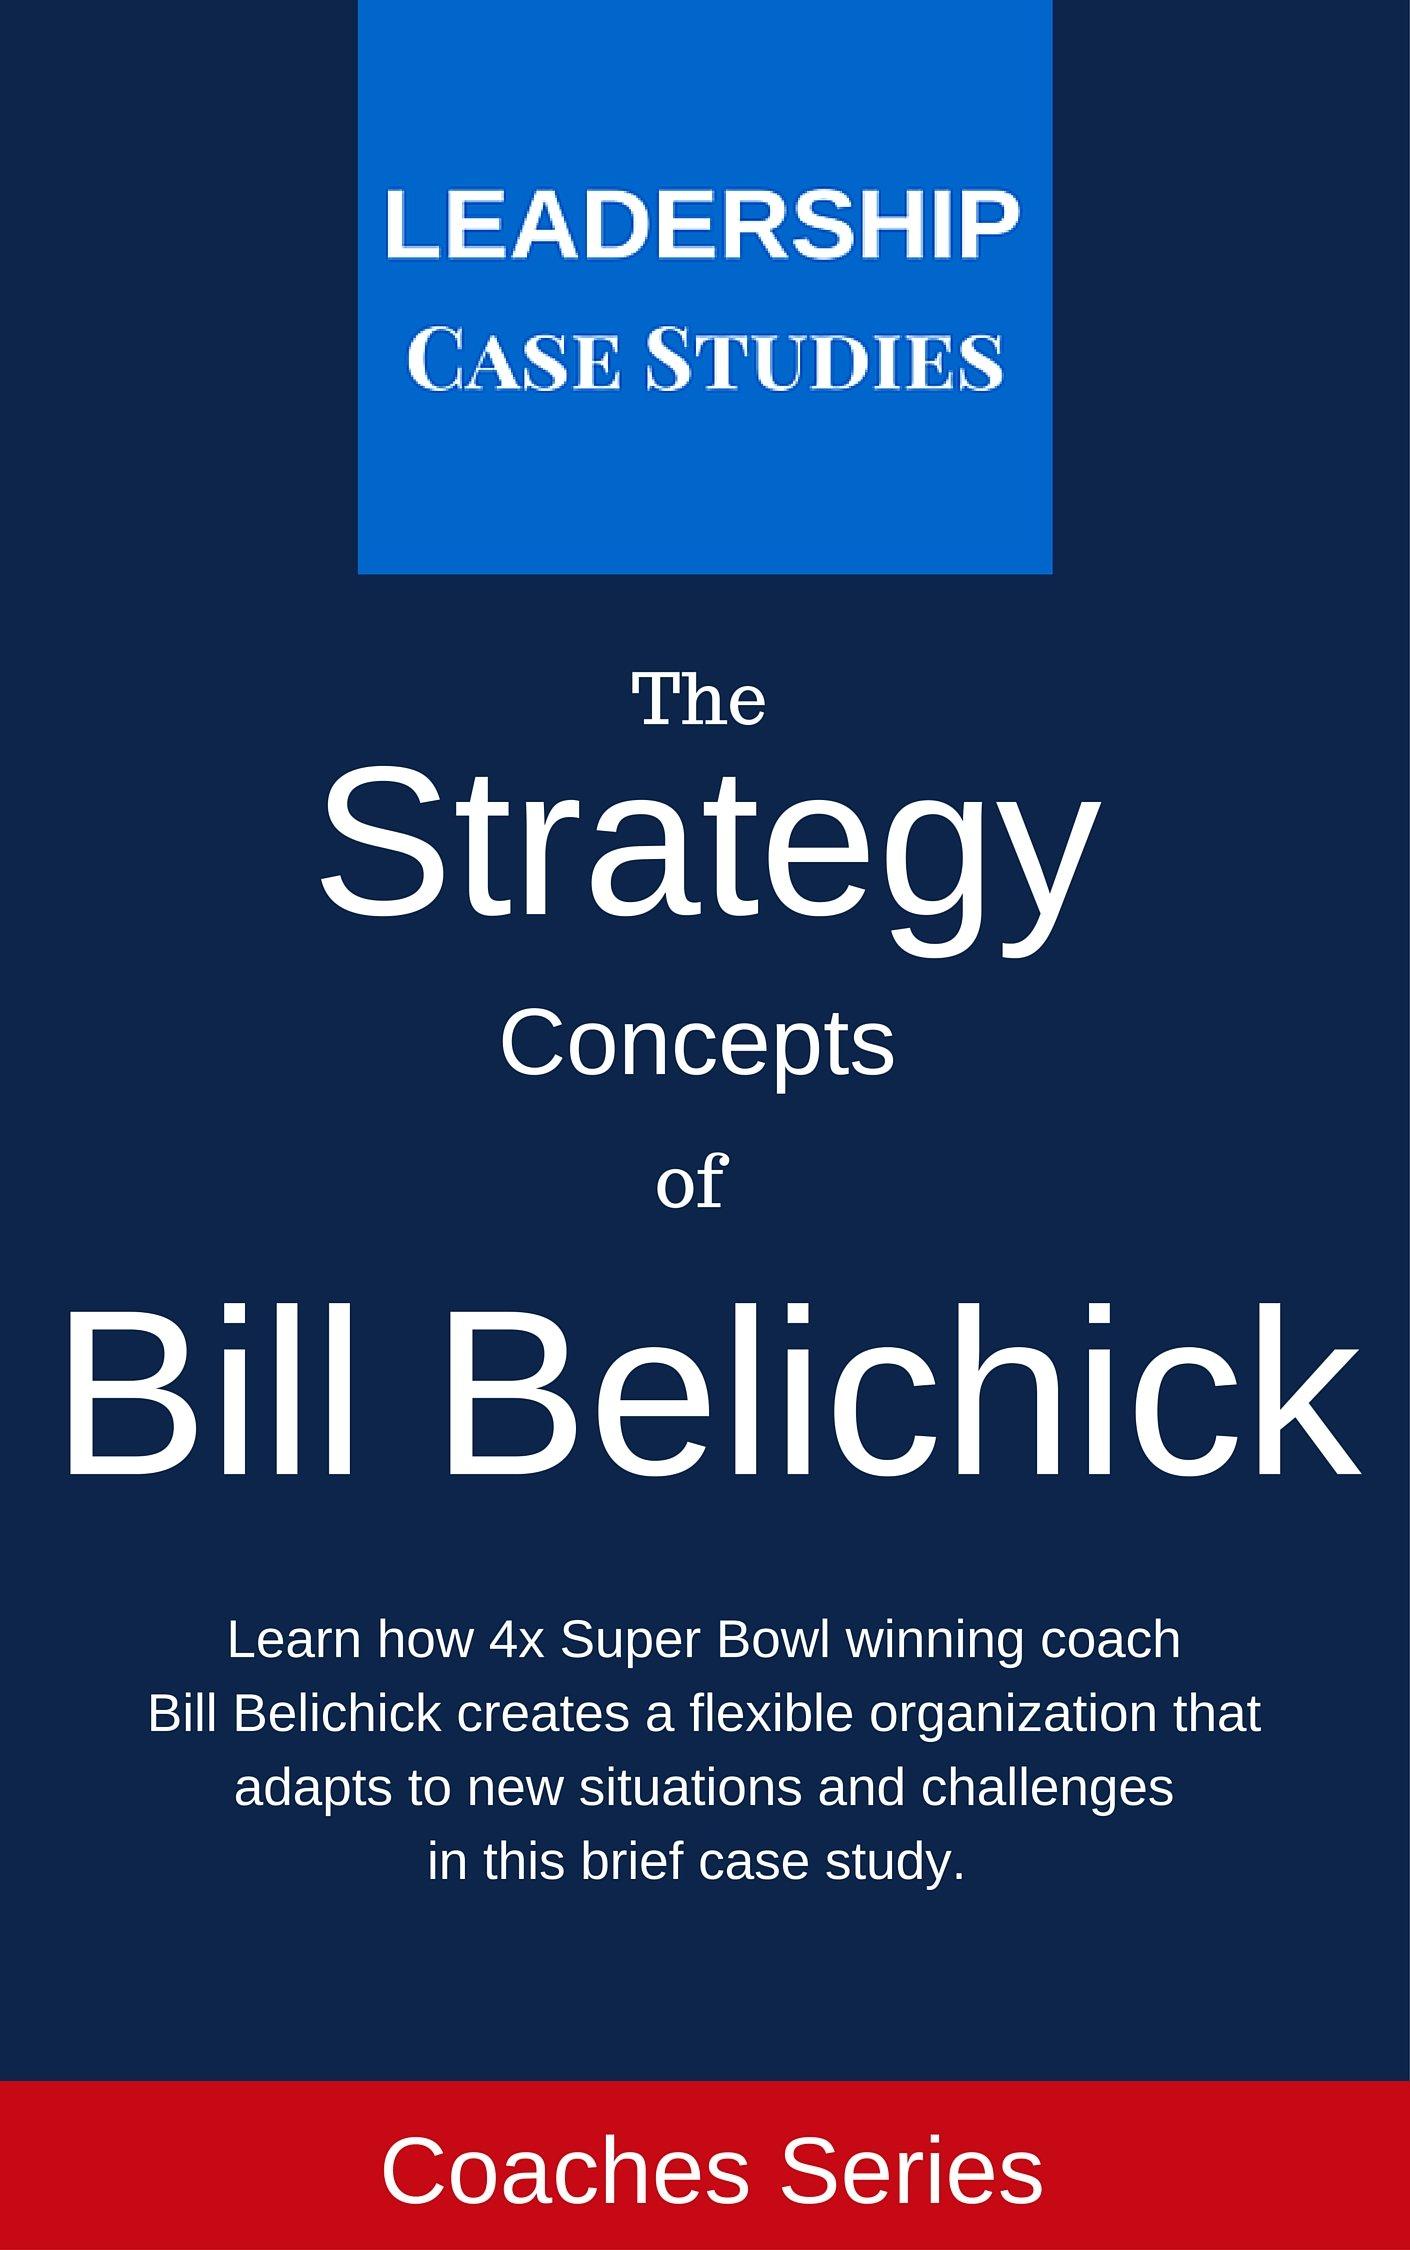 netflixs competitive advantage and strategies essay